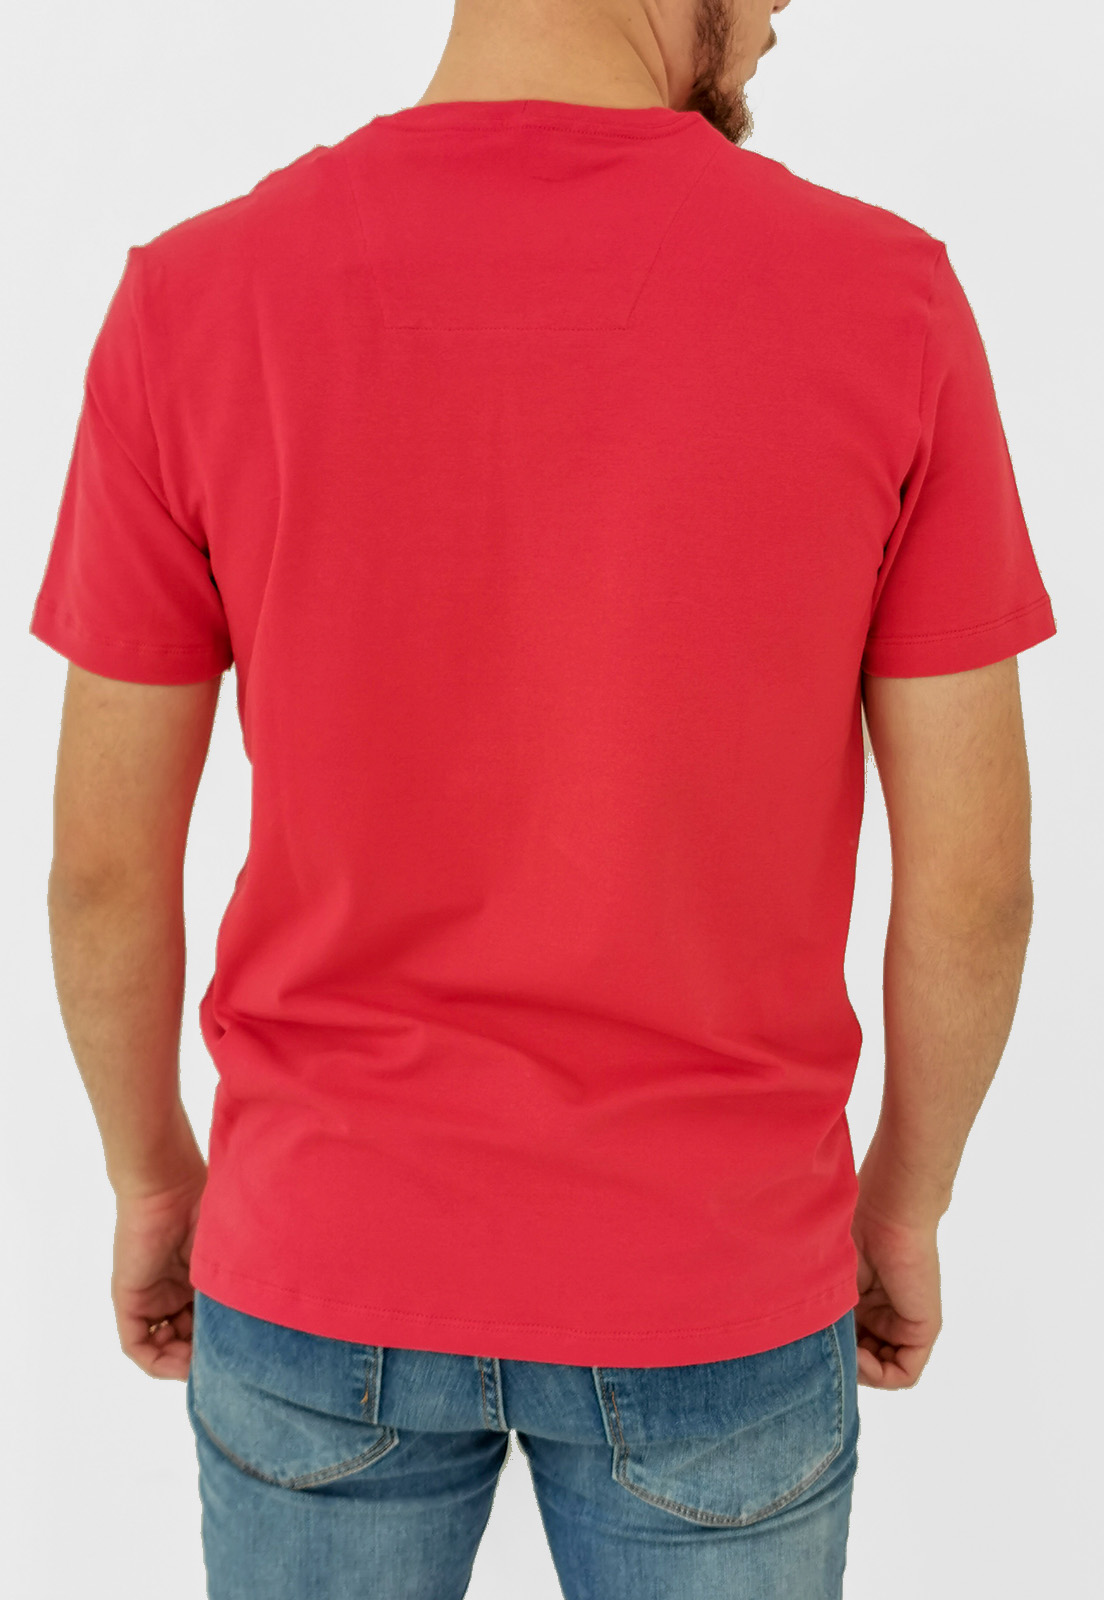 Camiseta Baumgarten Básica Vermelho Elastano